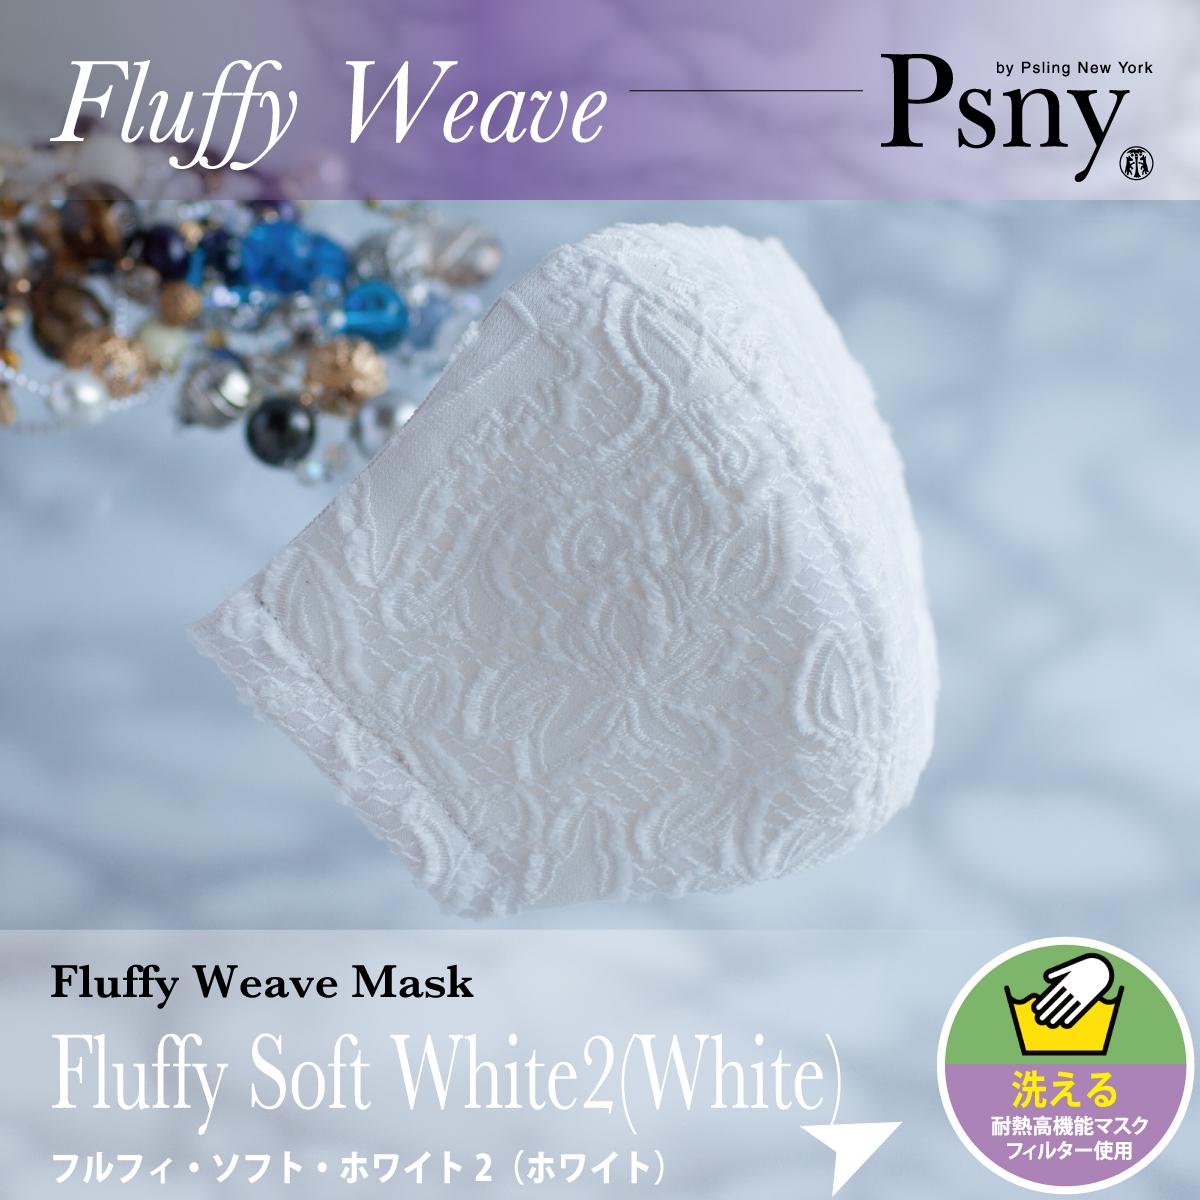 PSNY フルフィ・ソフト ホワイト2(ホワイト) 花粉 黄砂 洗える不織布フィルター入り 立体 大人用 マスク 送料無料 LF6